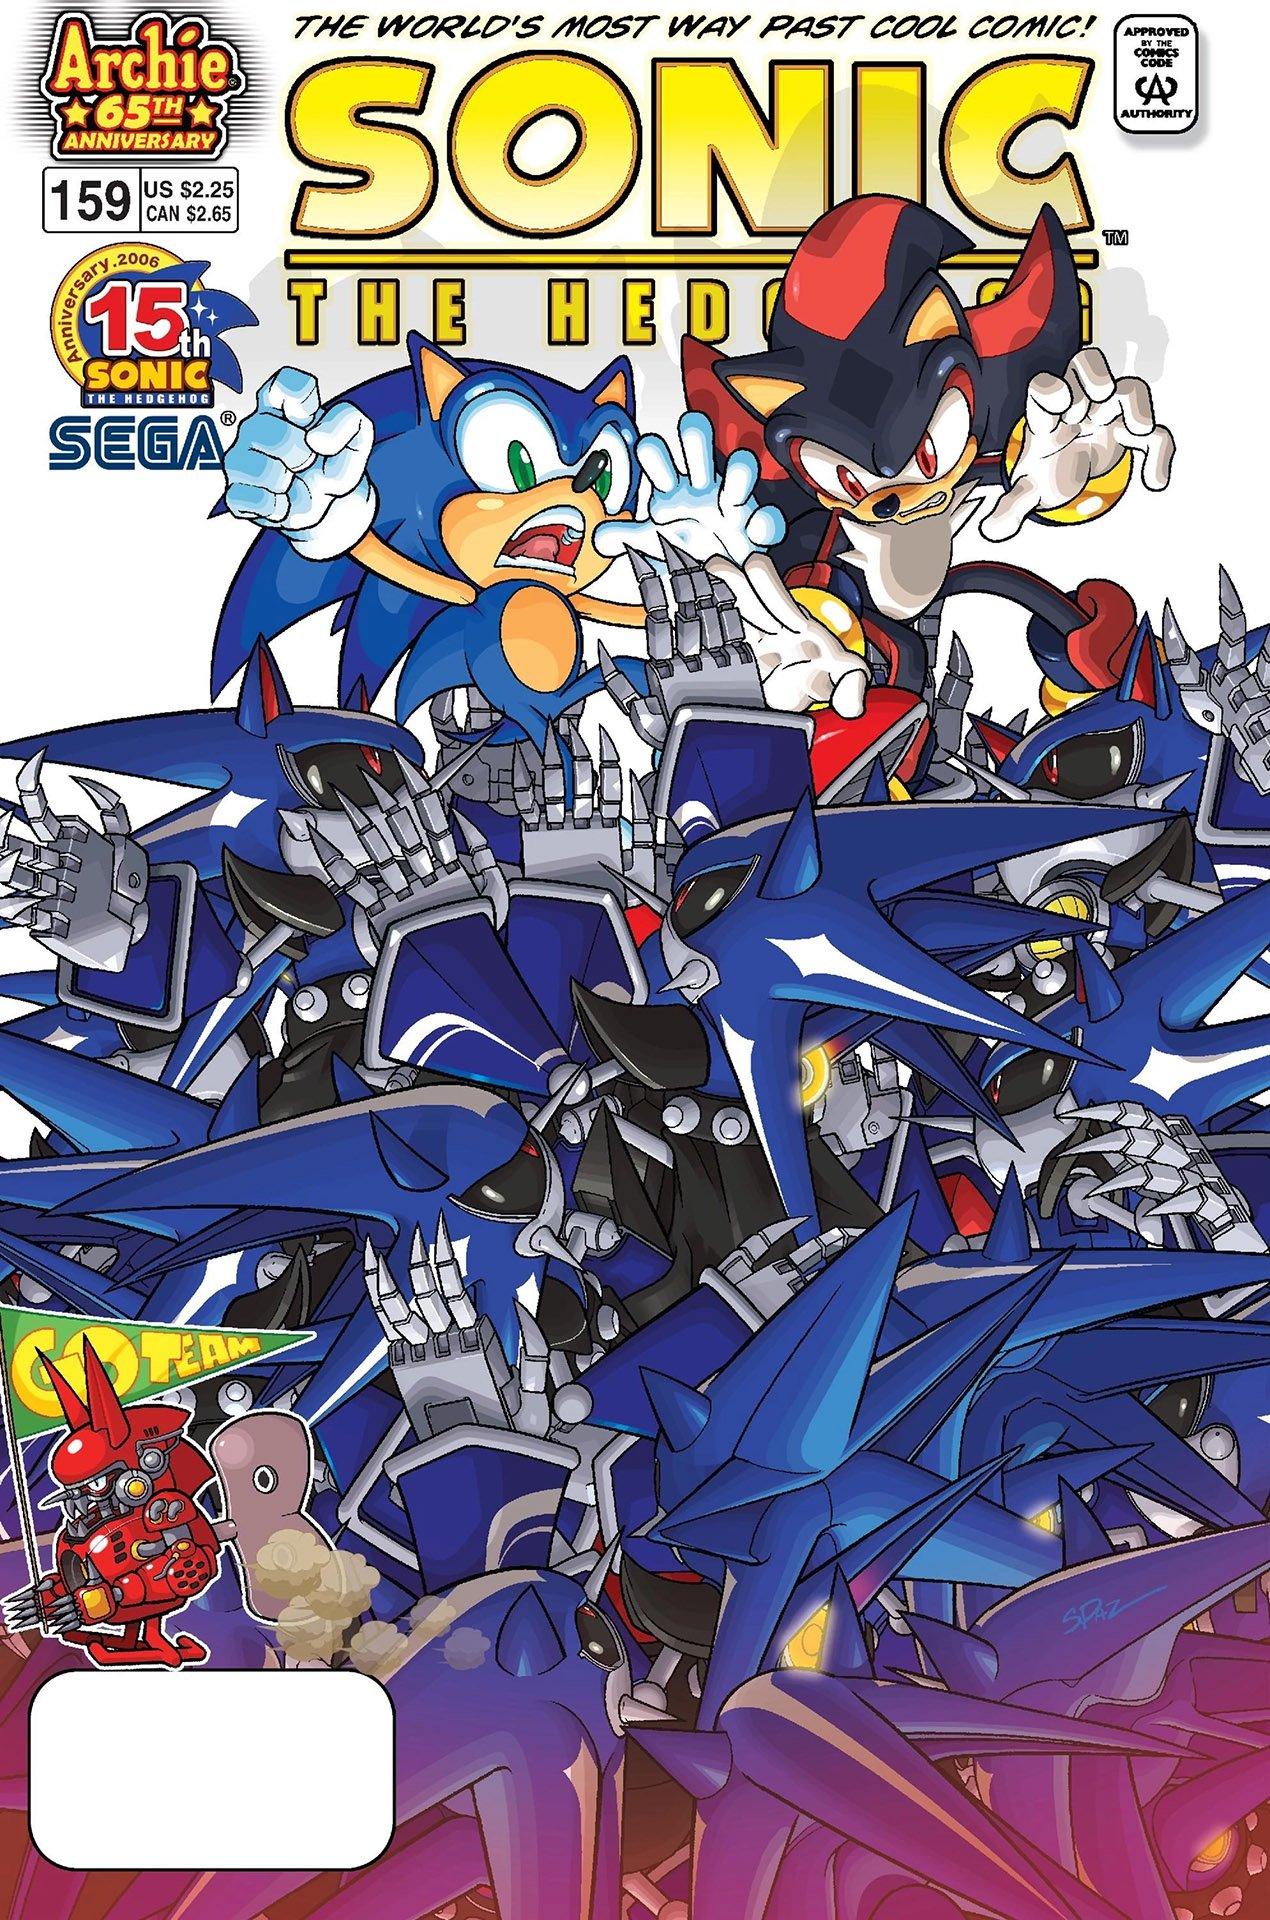 Sonic the Hedgehog 159 (April 2006)